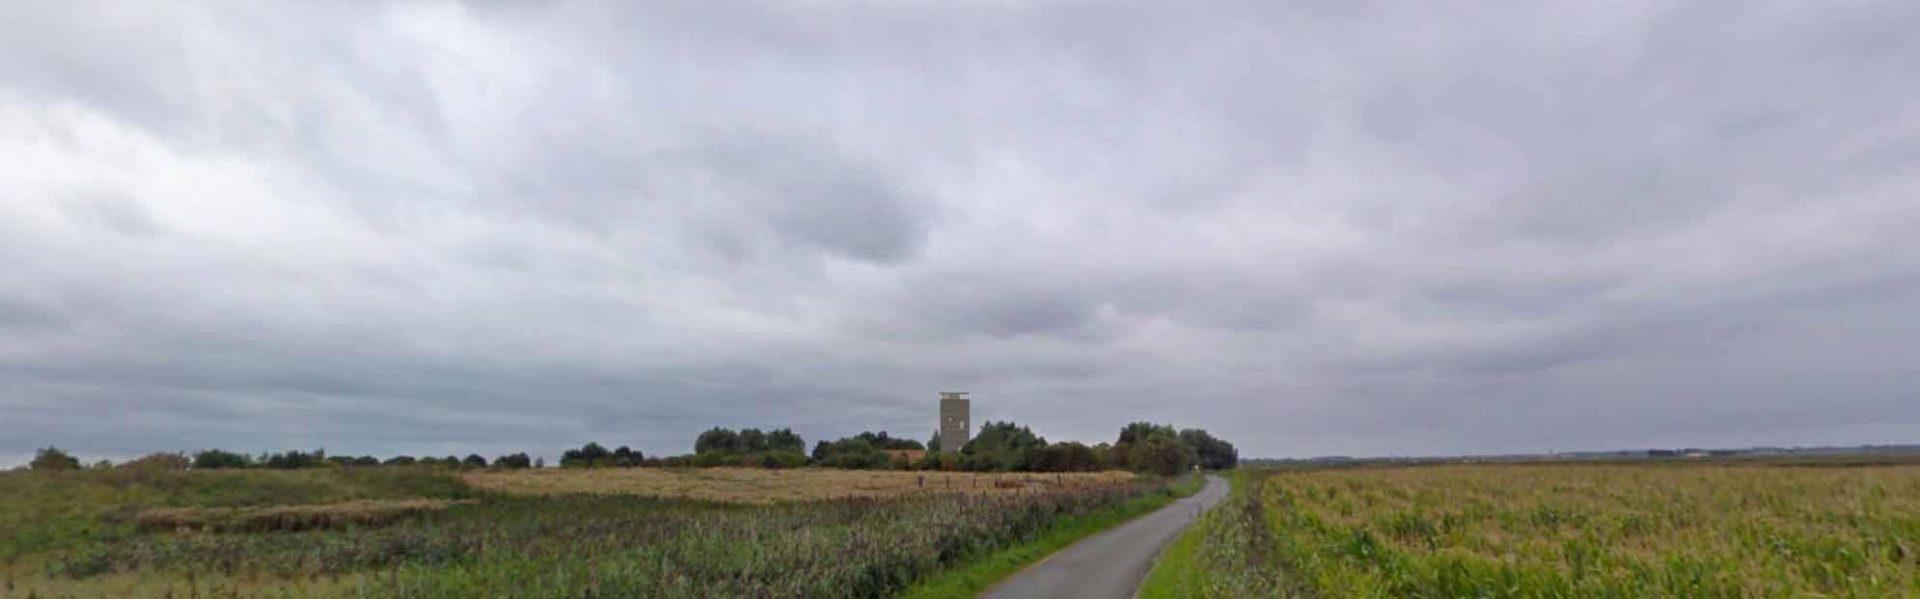 Toren Landscape Far View